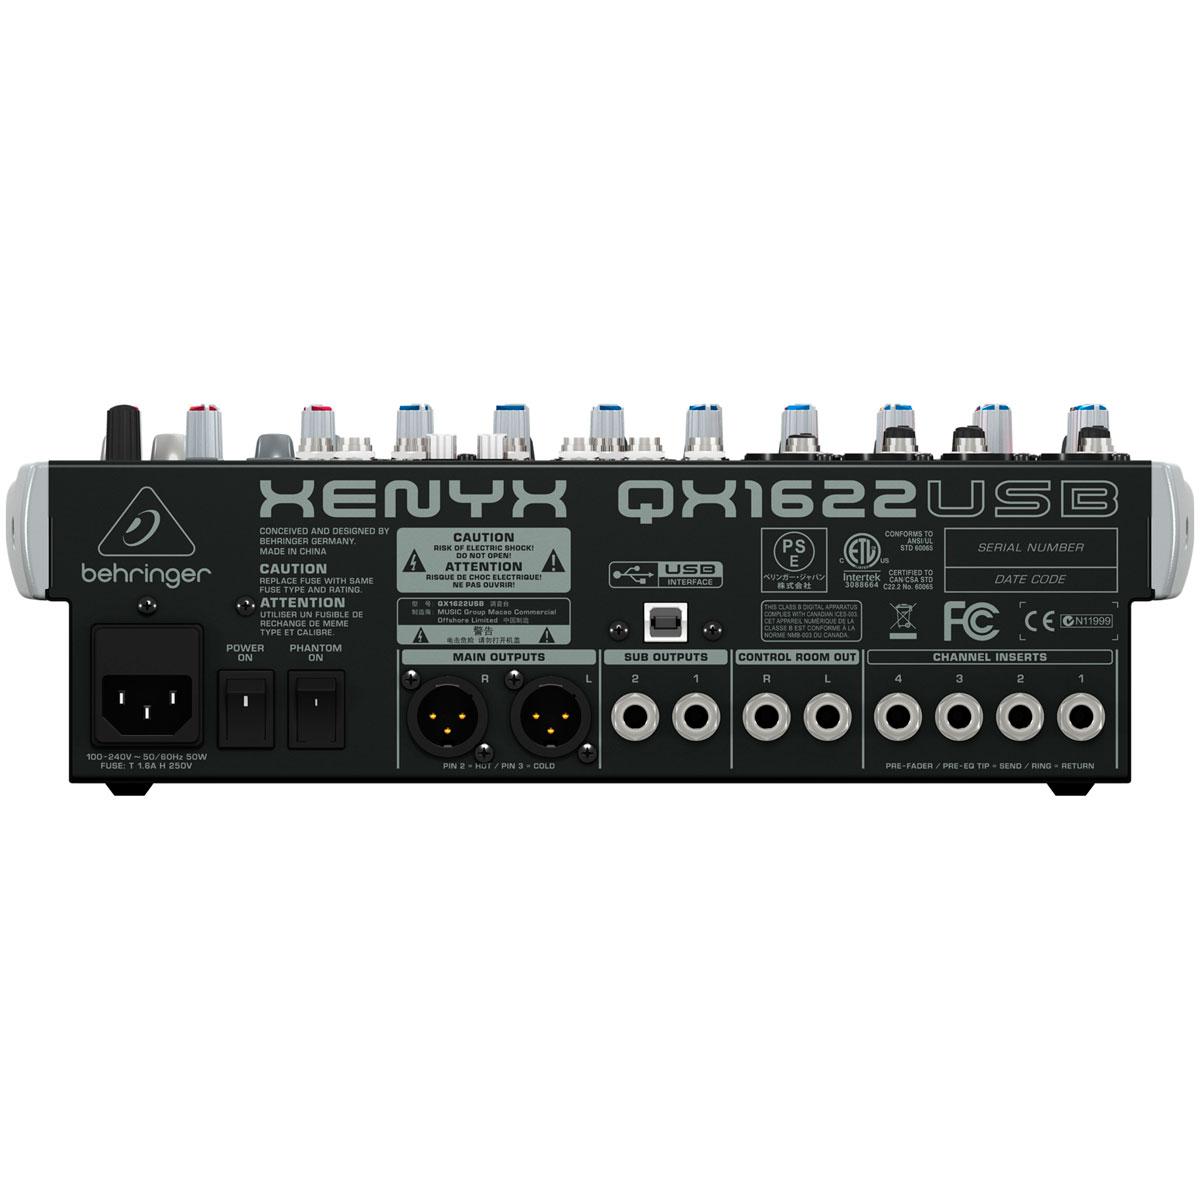 Mesa de Som 16 Canais Balanceados (4 XLR + 12 P10) c/ USB / Efeito / Phantom / 2 Auxiliares Xenyx QX 1622 USB - Behringer